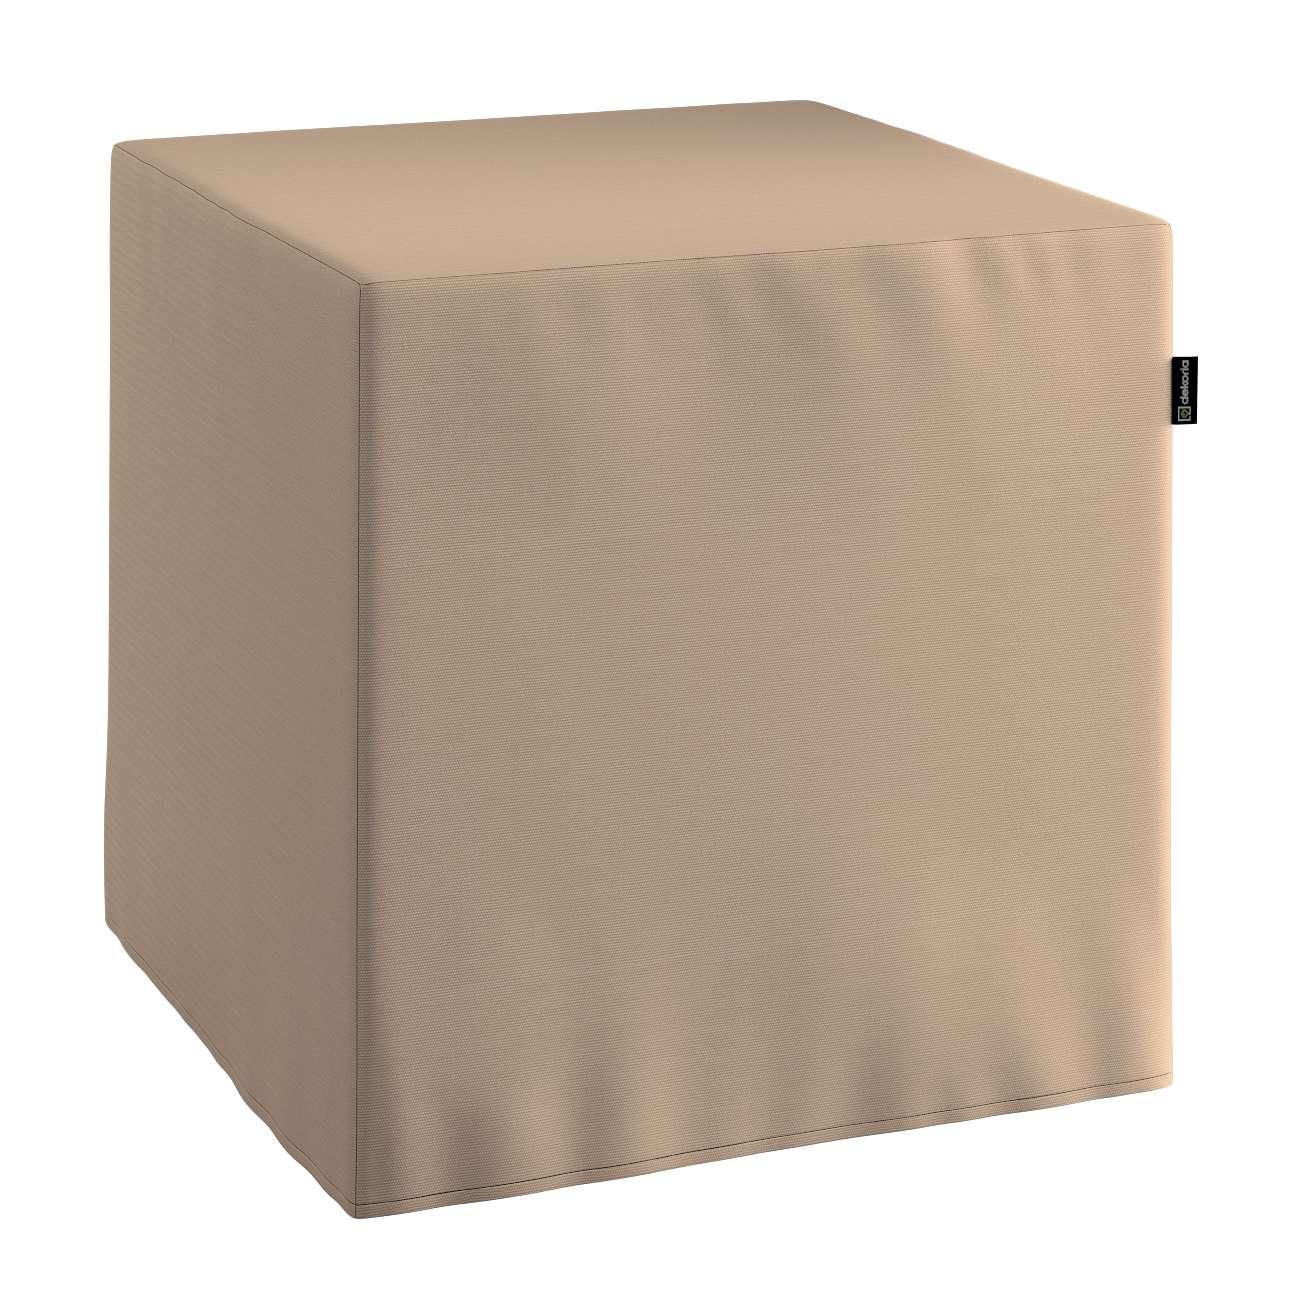 Sedák kostka - pevná 40 x 40 x 40 cm v kolekci Cotton Panama, látka: 702-28